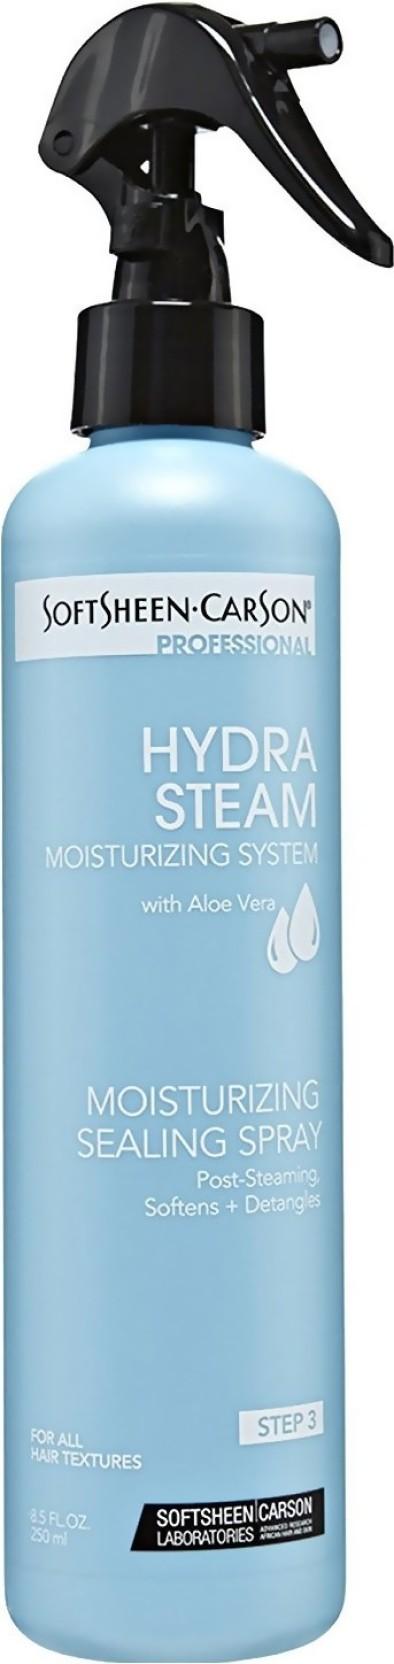 soft sheen carson hydra steam reviews